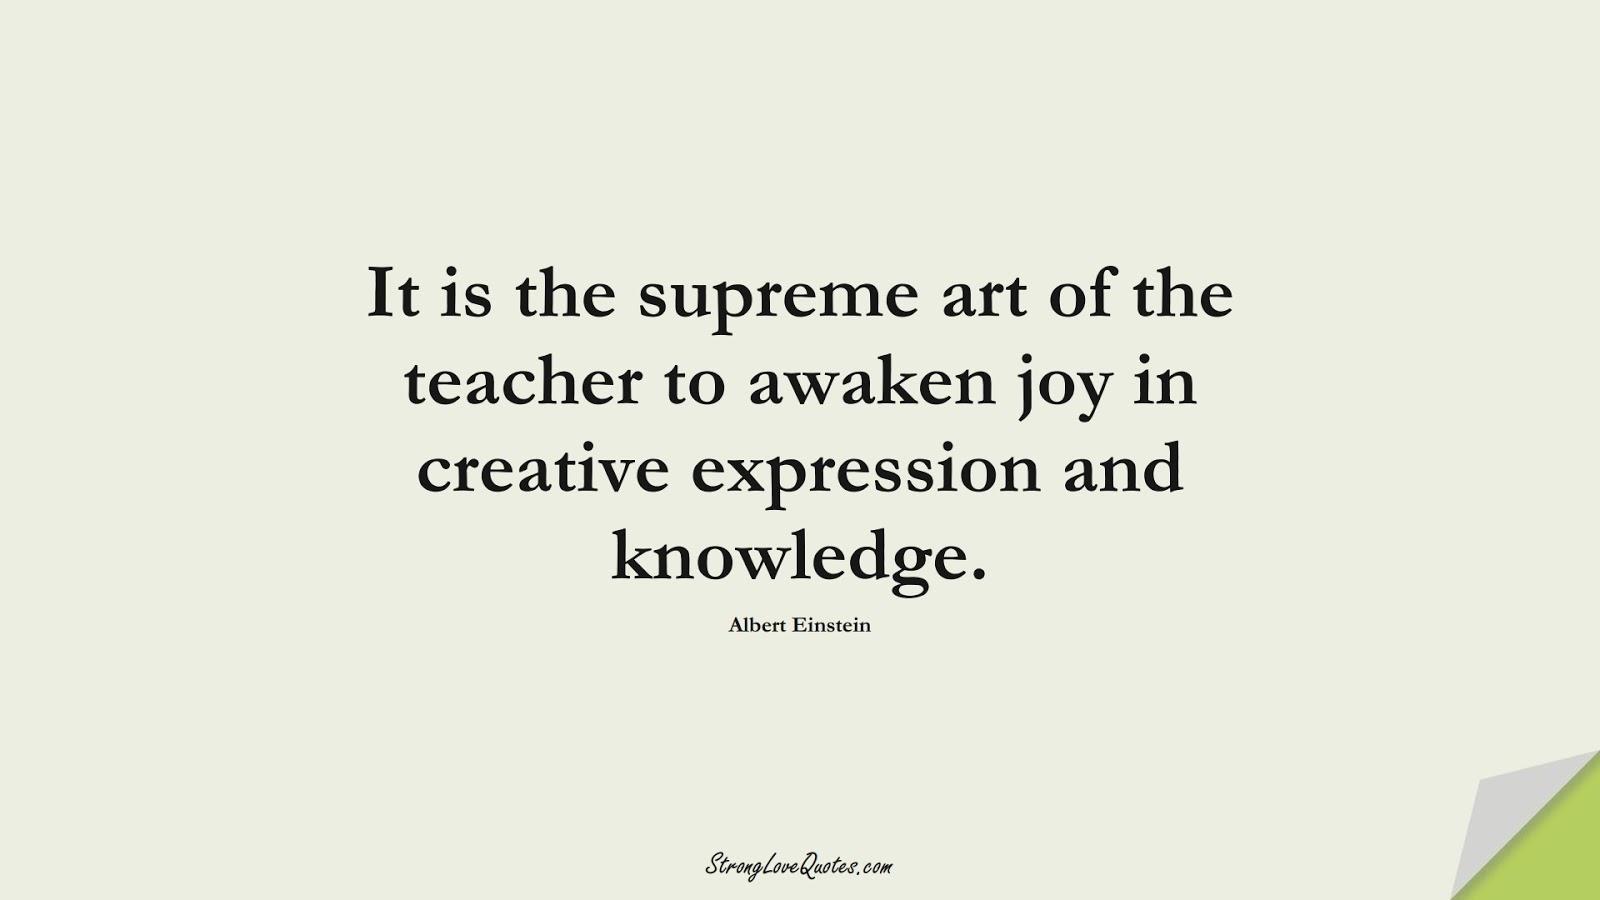 It is the supreme art of the teacher to awaken joy in creative expression and knowledge. (Albert Einstein);  #KnowledgeQuotes